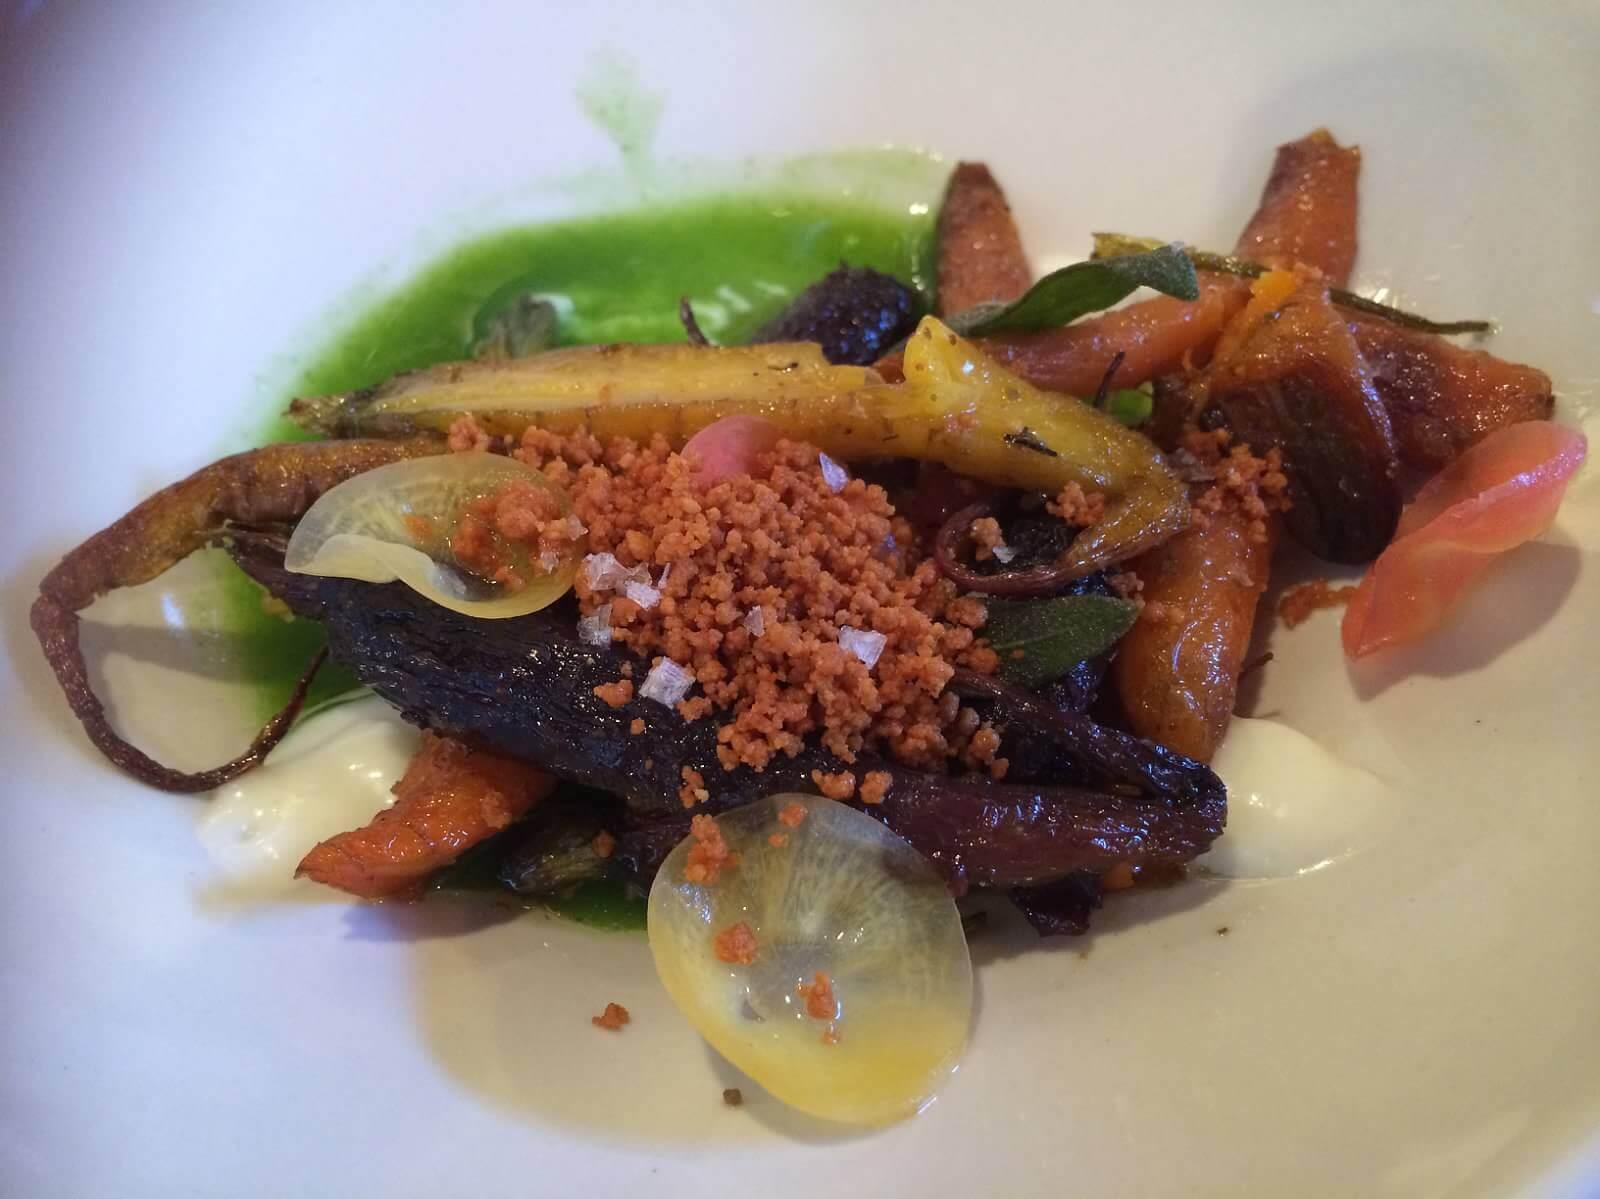 Roasted heirloom carrots, coconut gel, brown butter crumbs